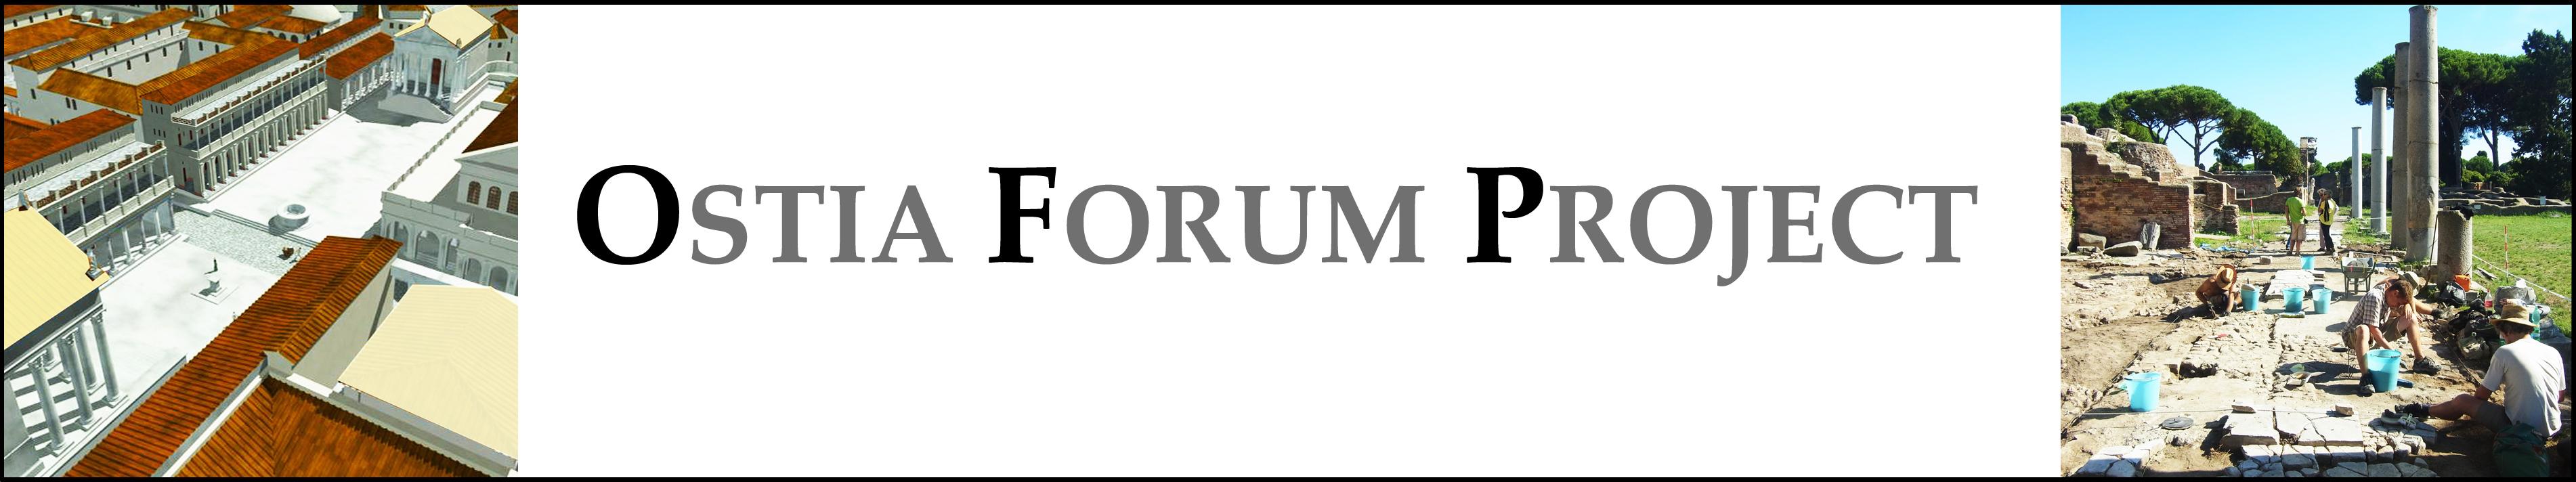 Ostia Forum Project